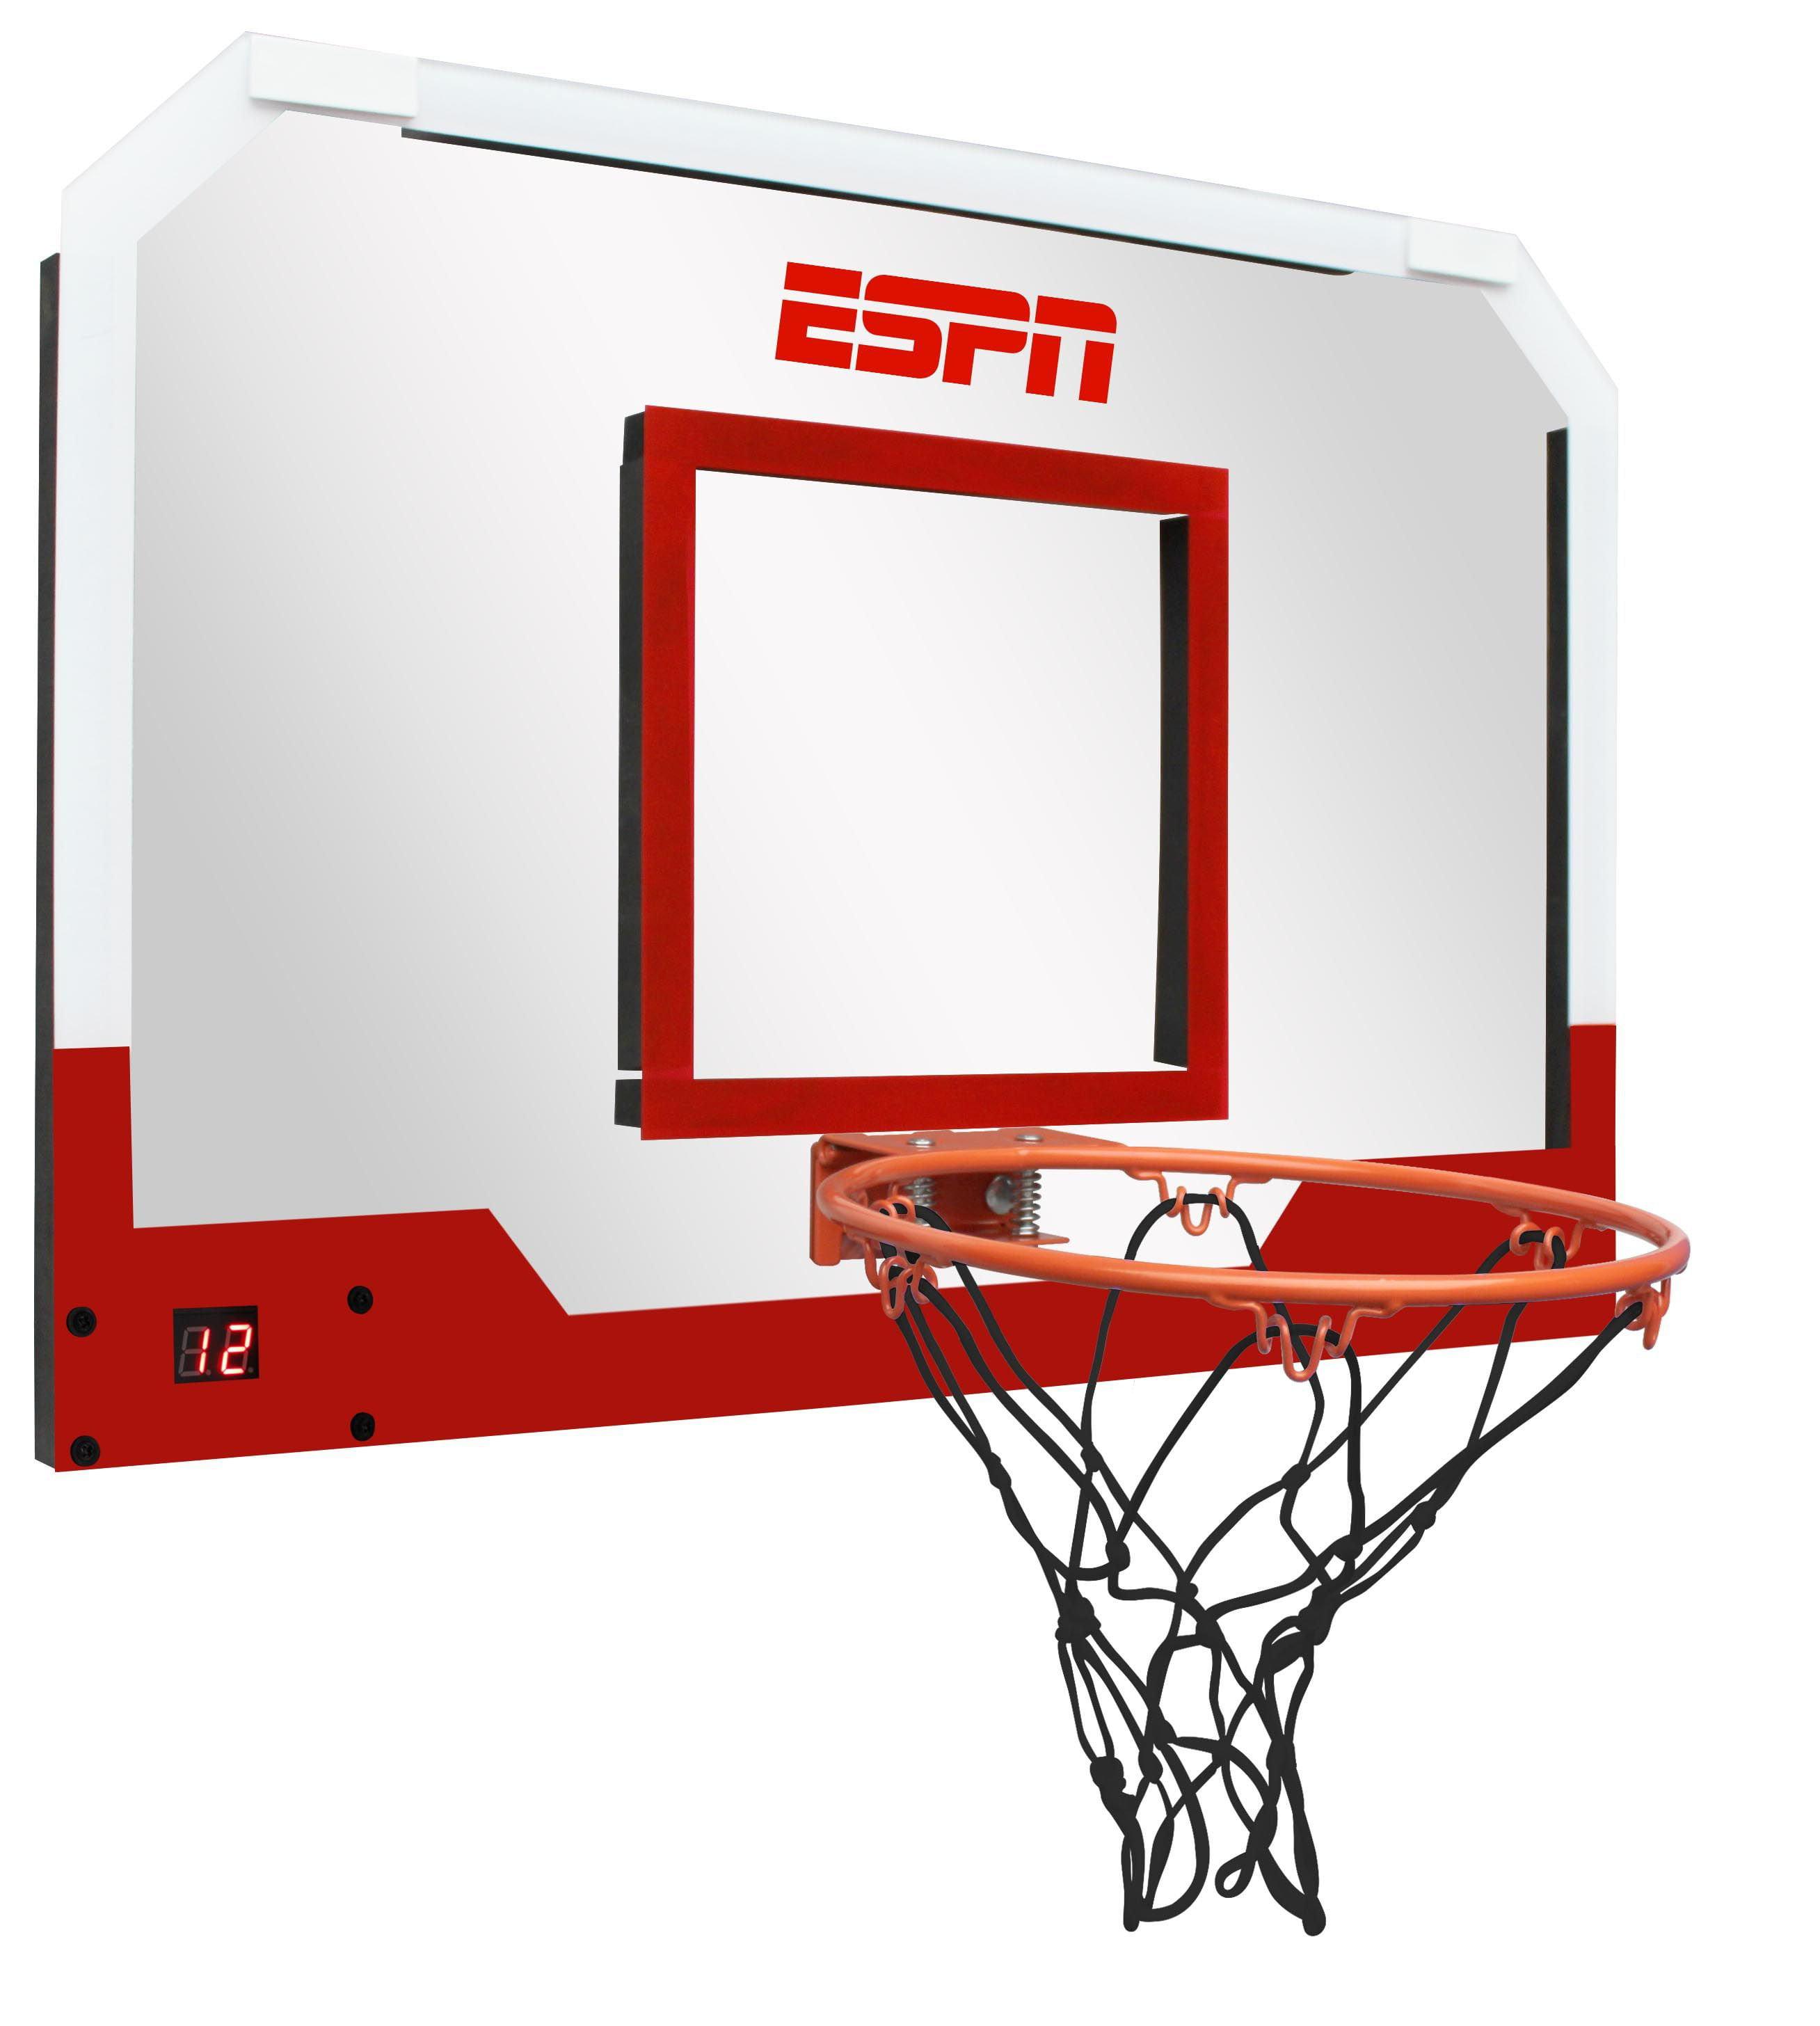 Medal Sports ESPN Pro Basketball Door Hoop With LED Electronic Scoring |  1451803   Walmart.com